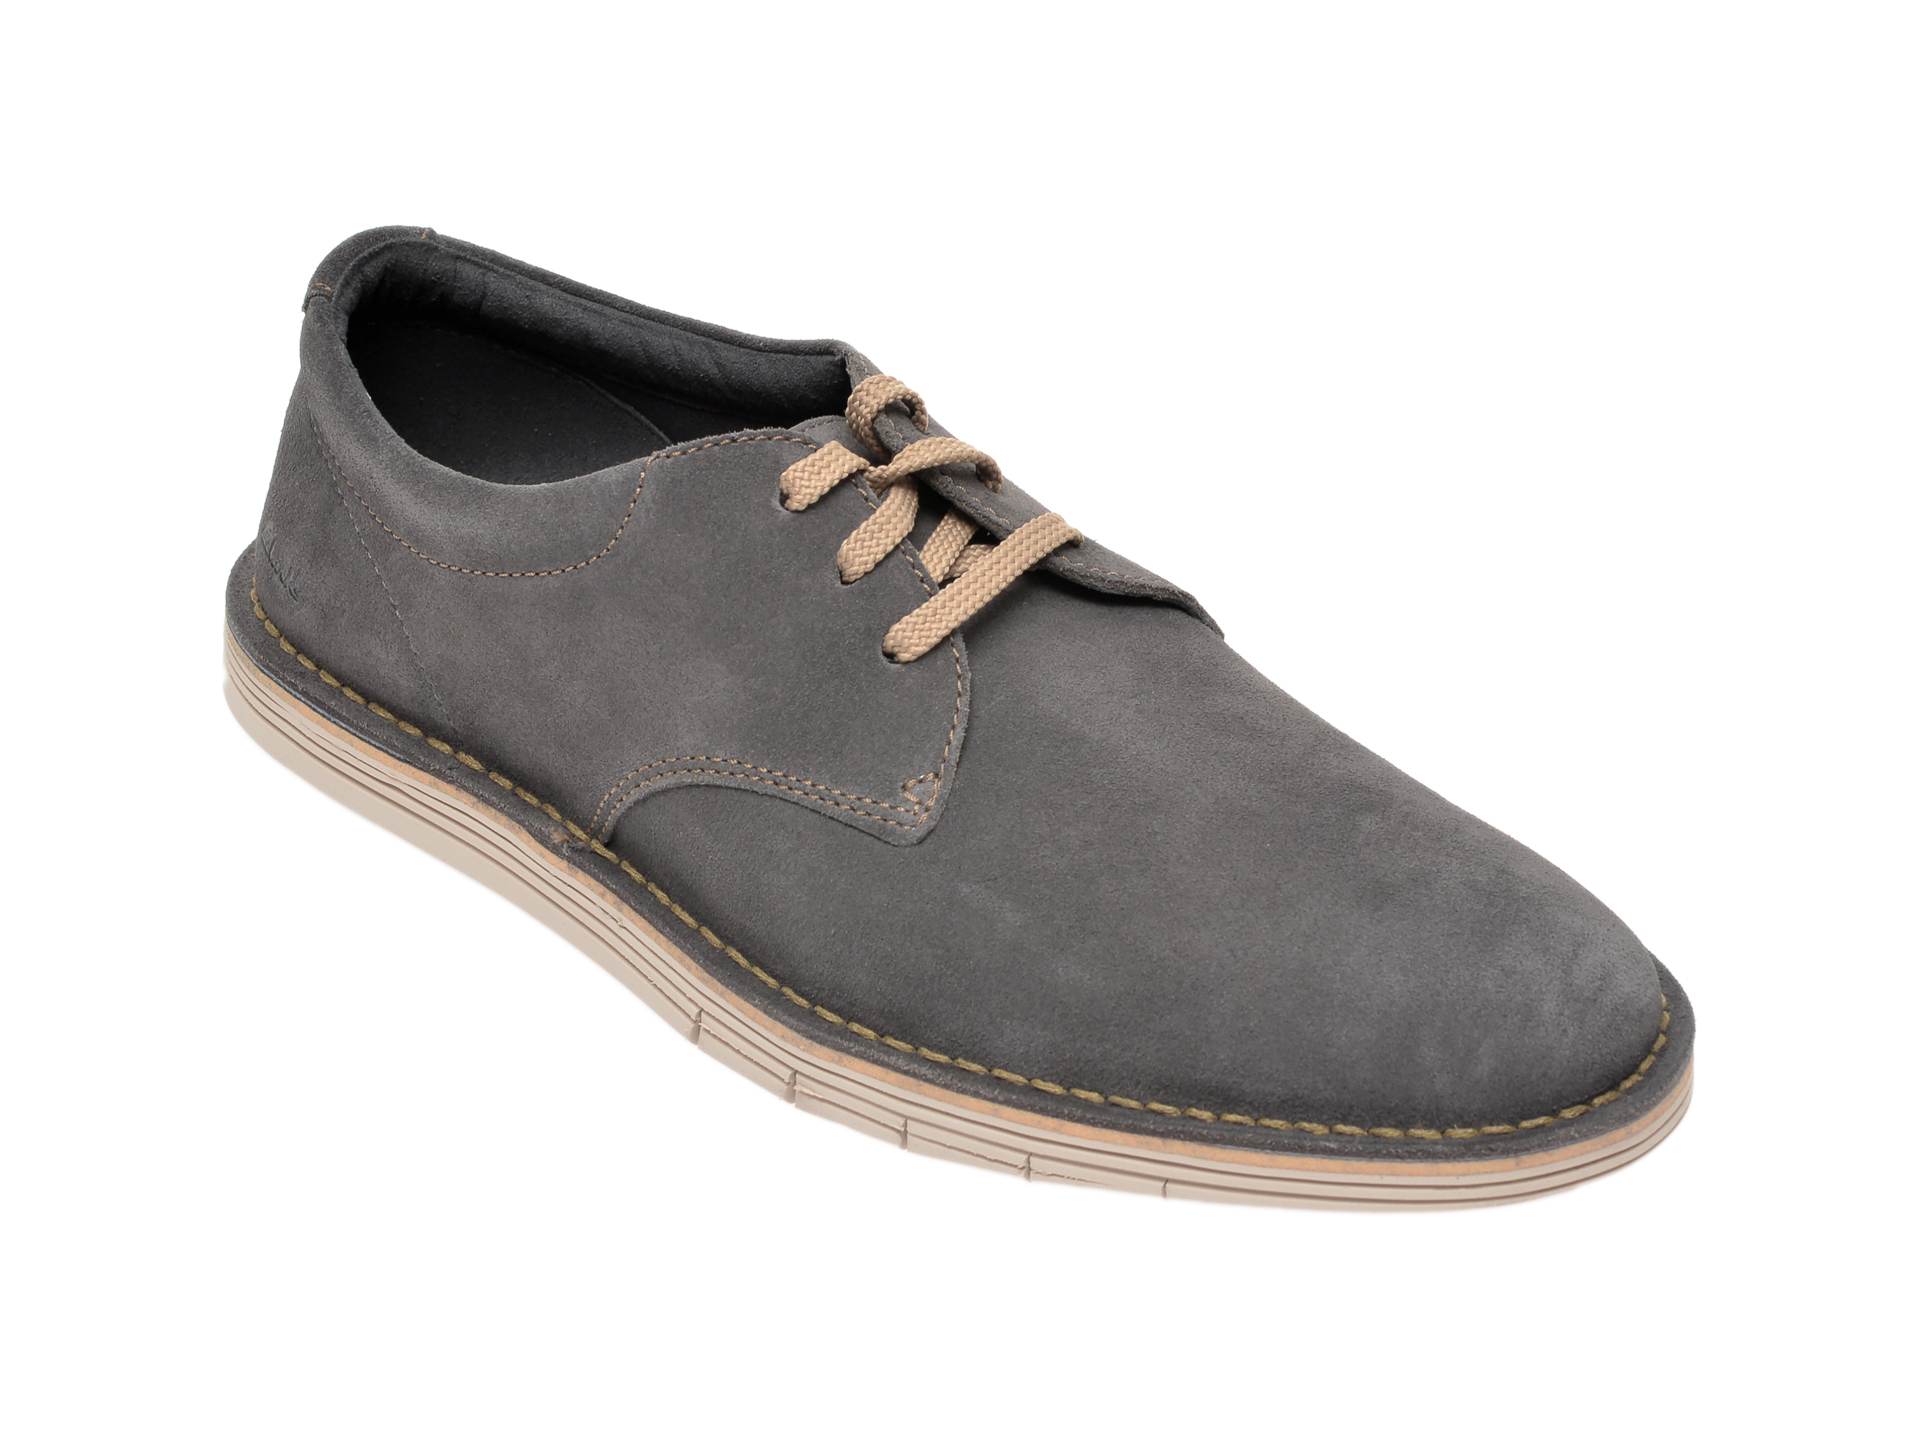 Pantofi CLARKS gri, Forge Vibe, din piele intoarsa